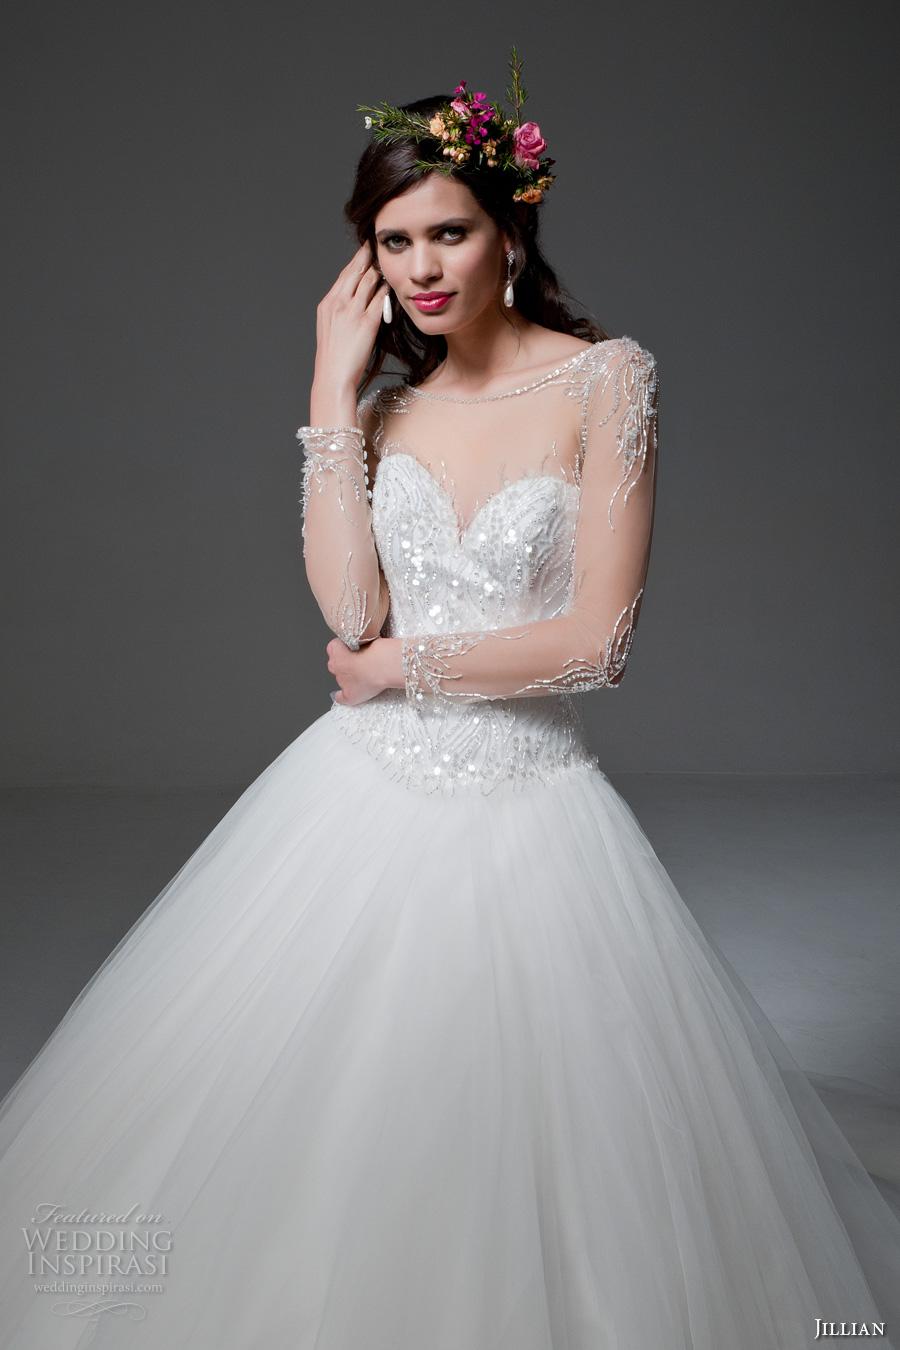 jillian 2017 bridal sheer long sleeves illusion bateau sweetheart neckline heavily embellished bodice tulle skirt princess ball gown wedding dress sheer back royal train (maura) zv